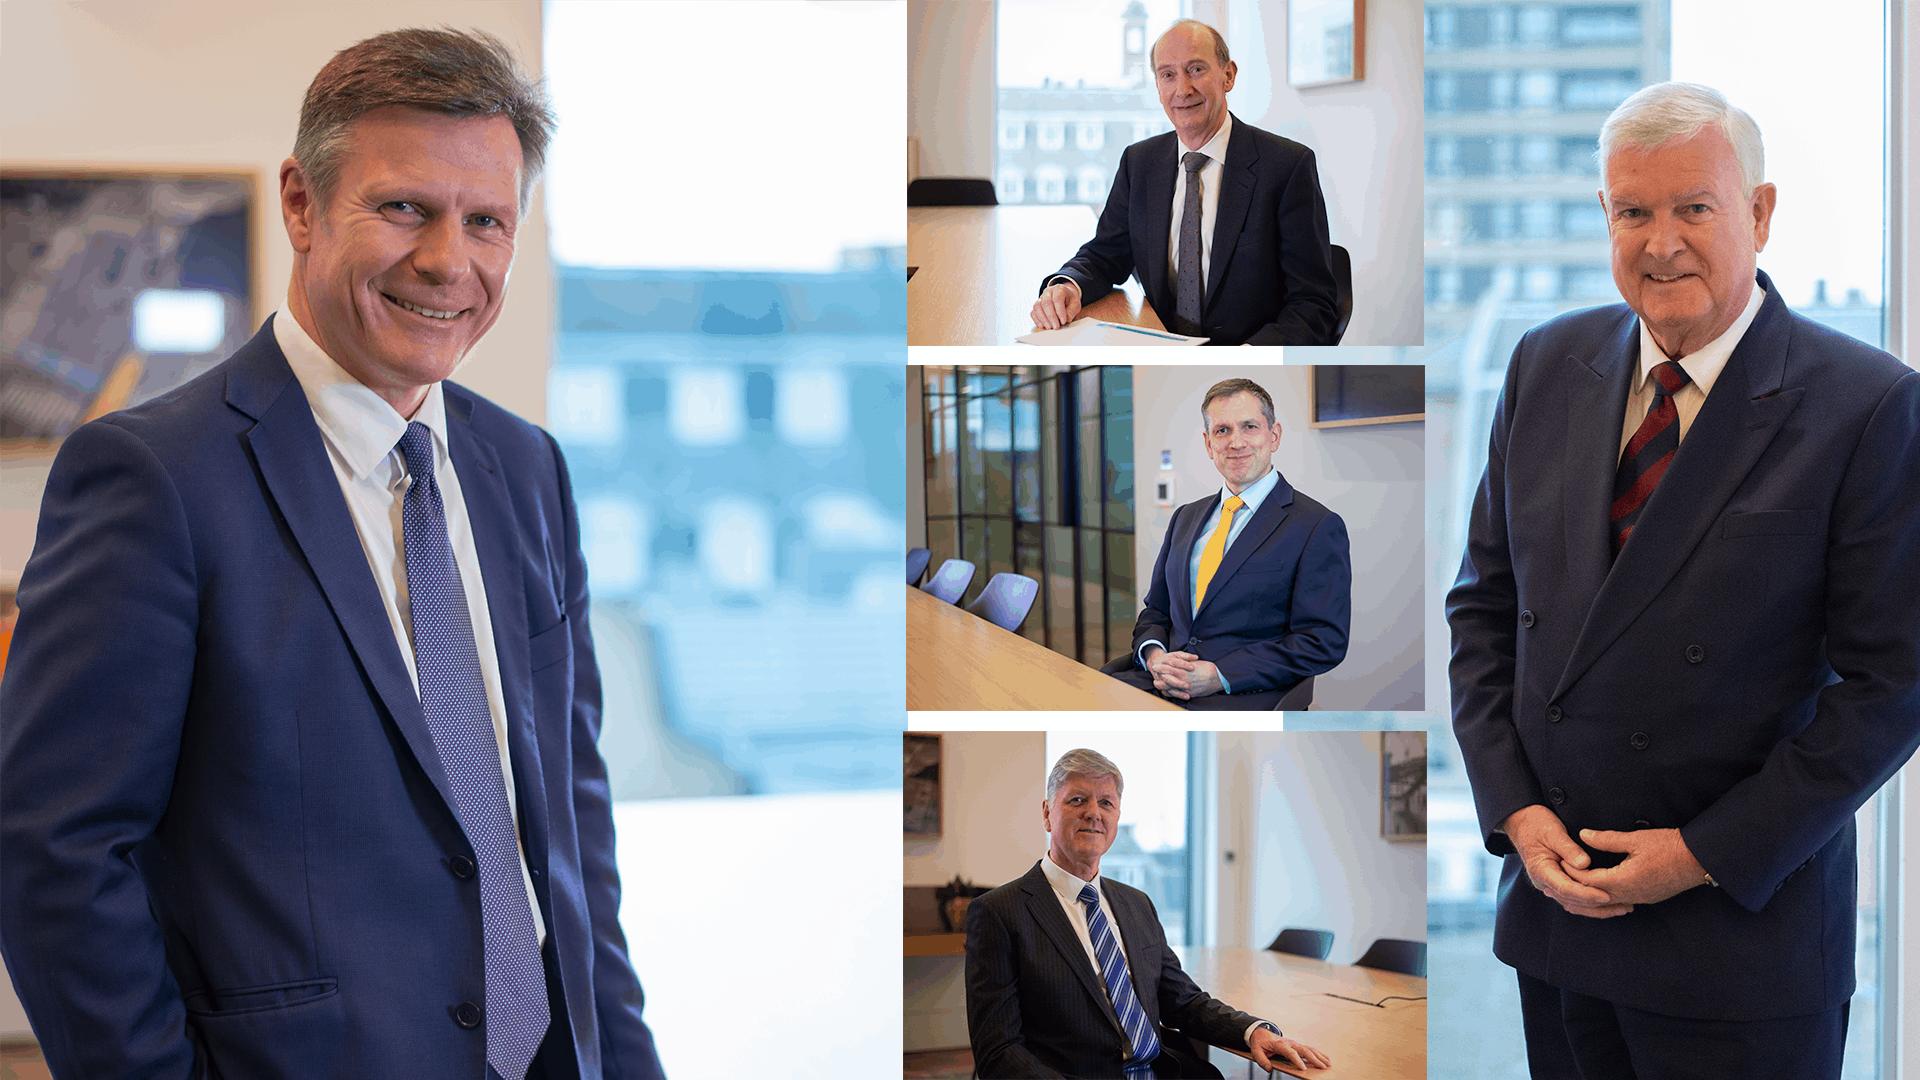 HSS Hire Board of Directors Photo Shoot – London